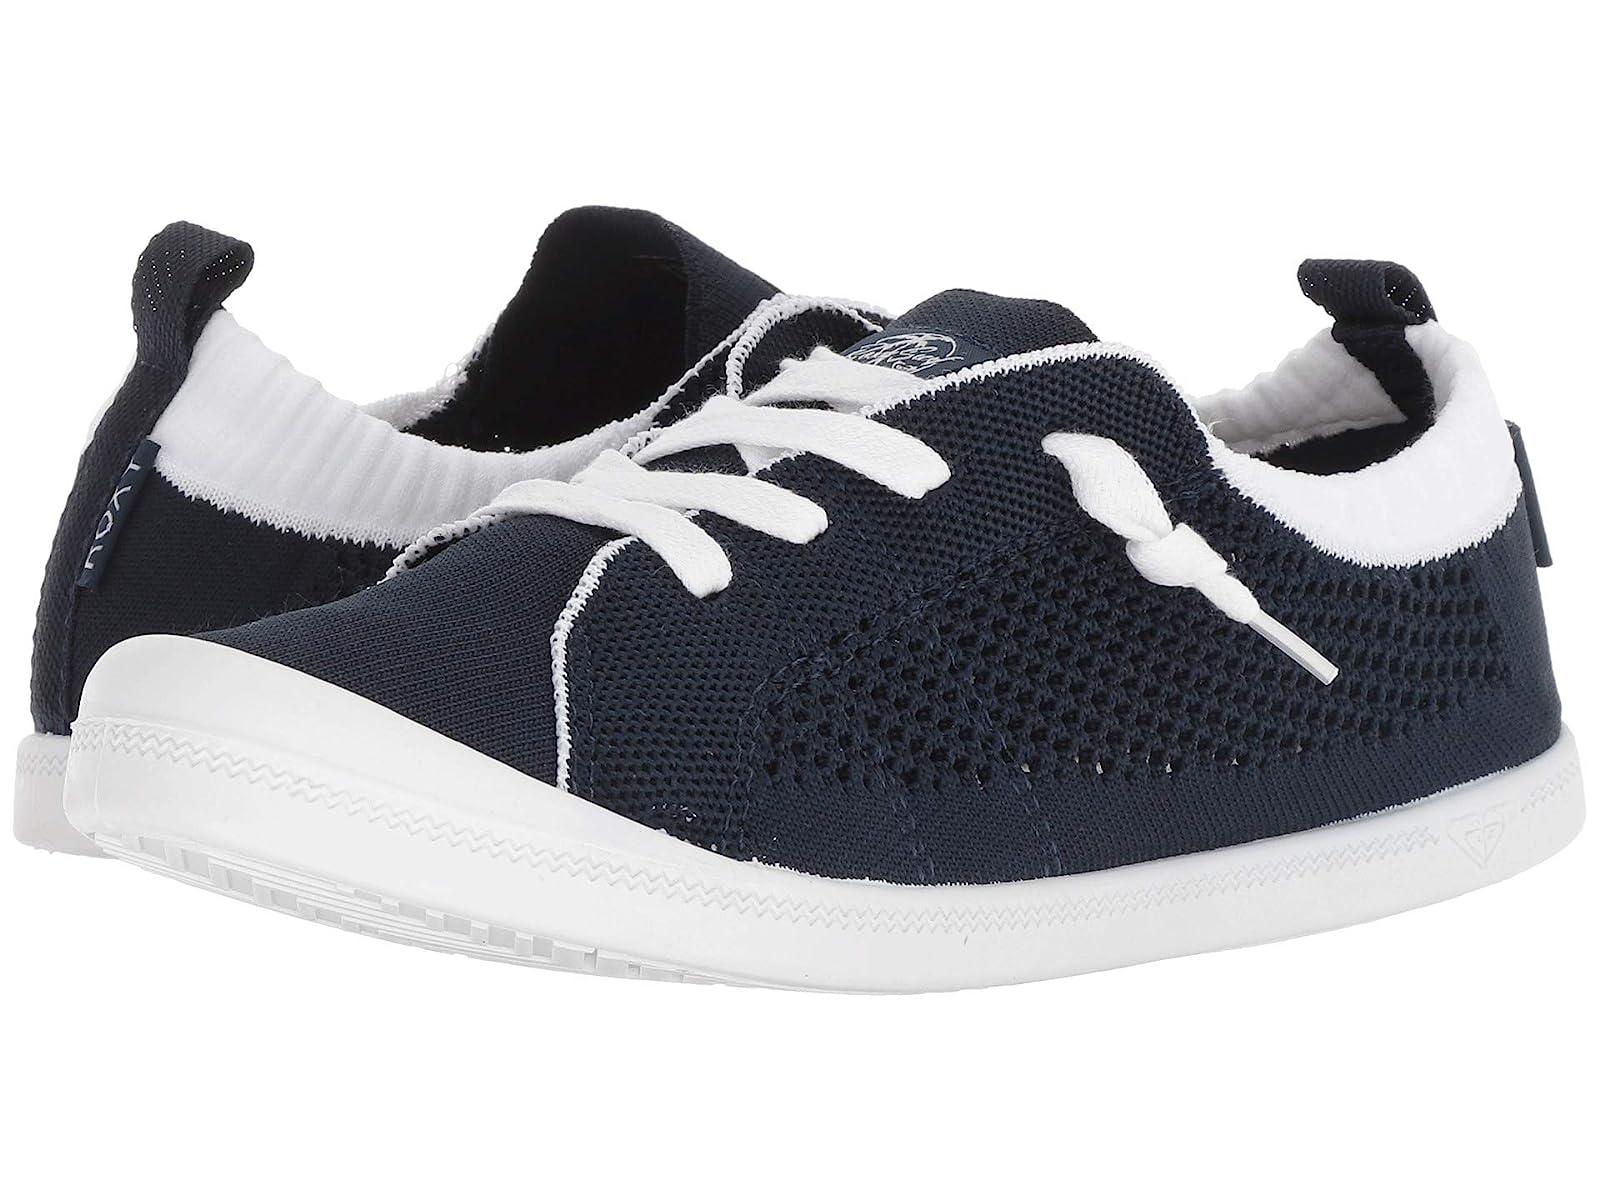 Roxy Bayshore KnitAtmospheric grades have affordable shoes